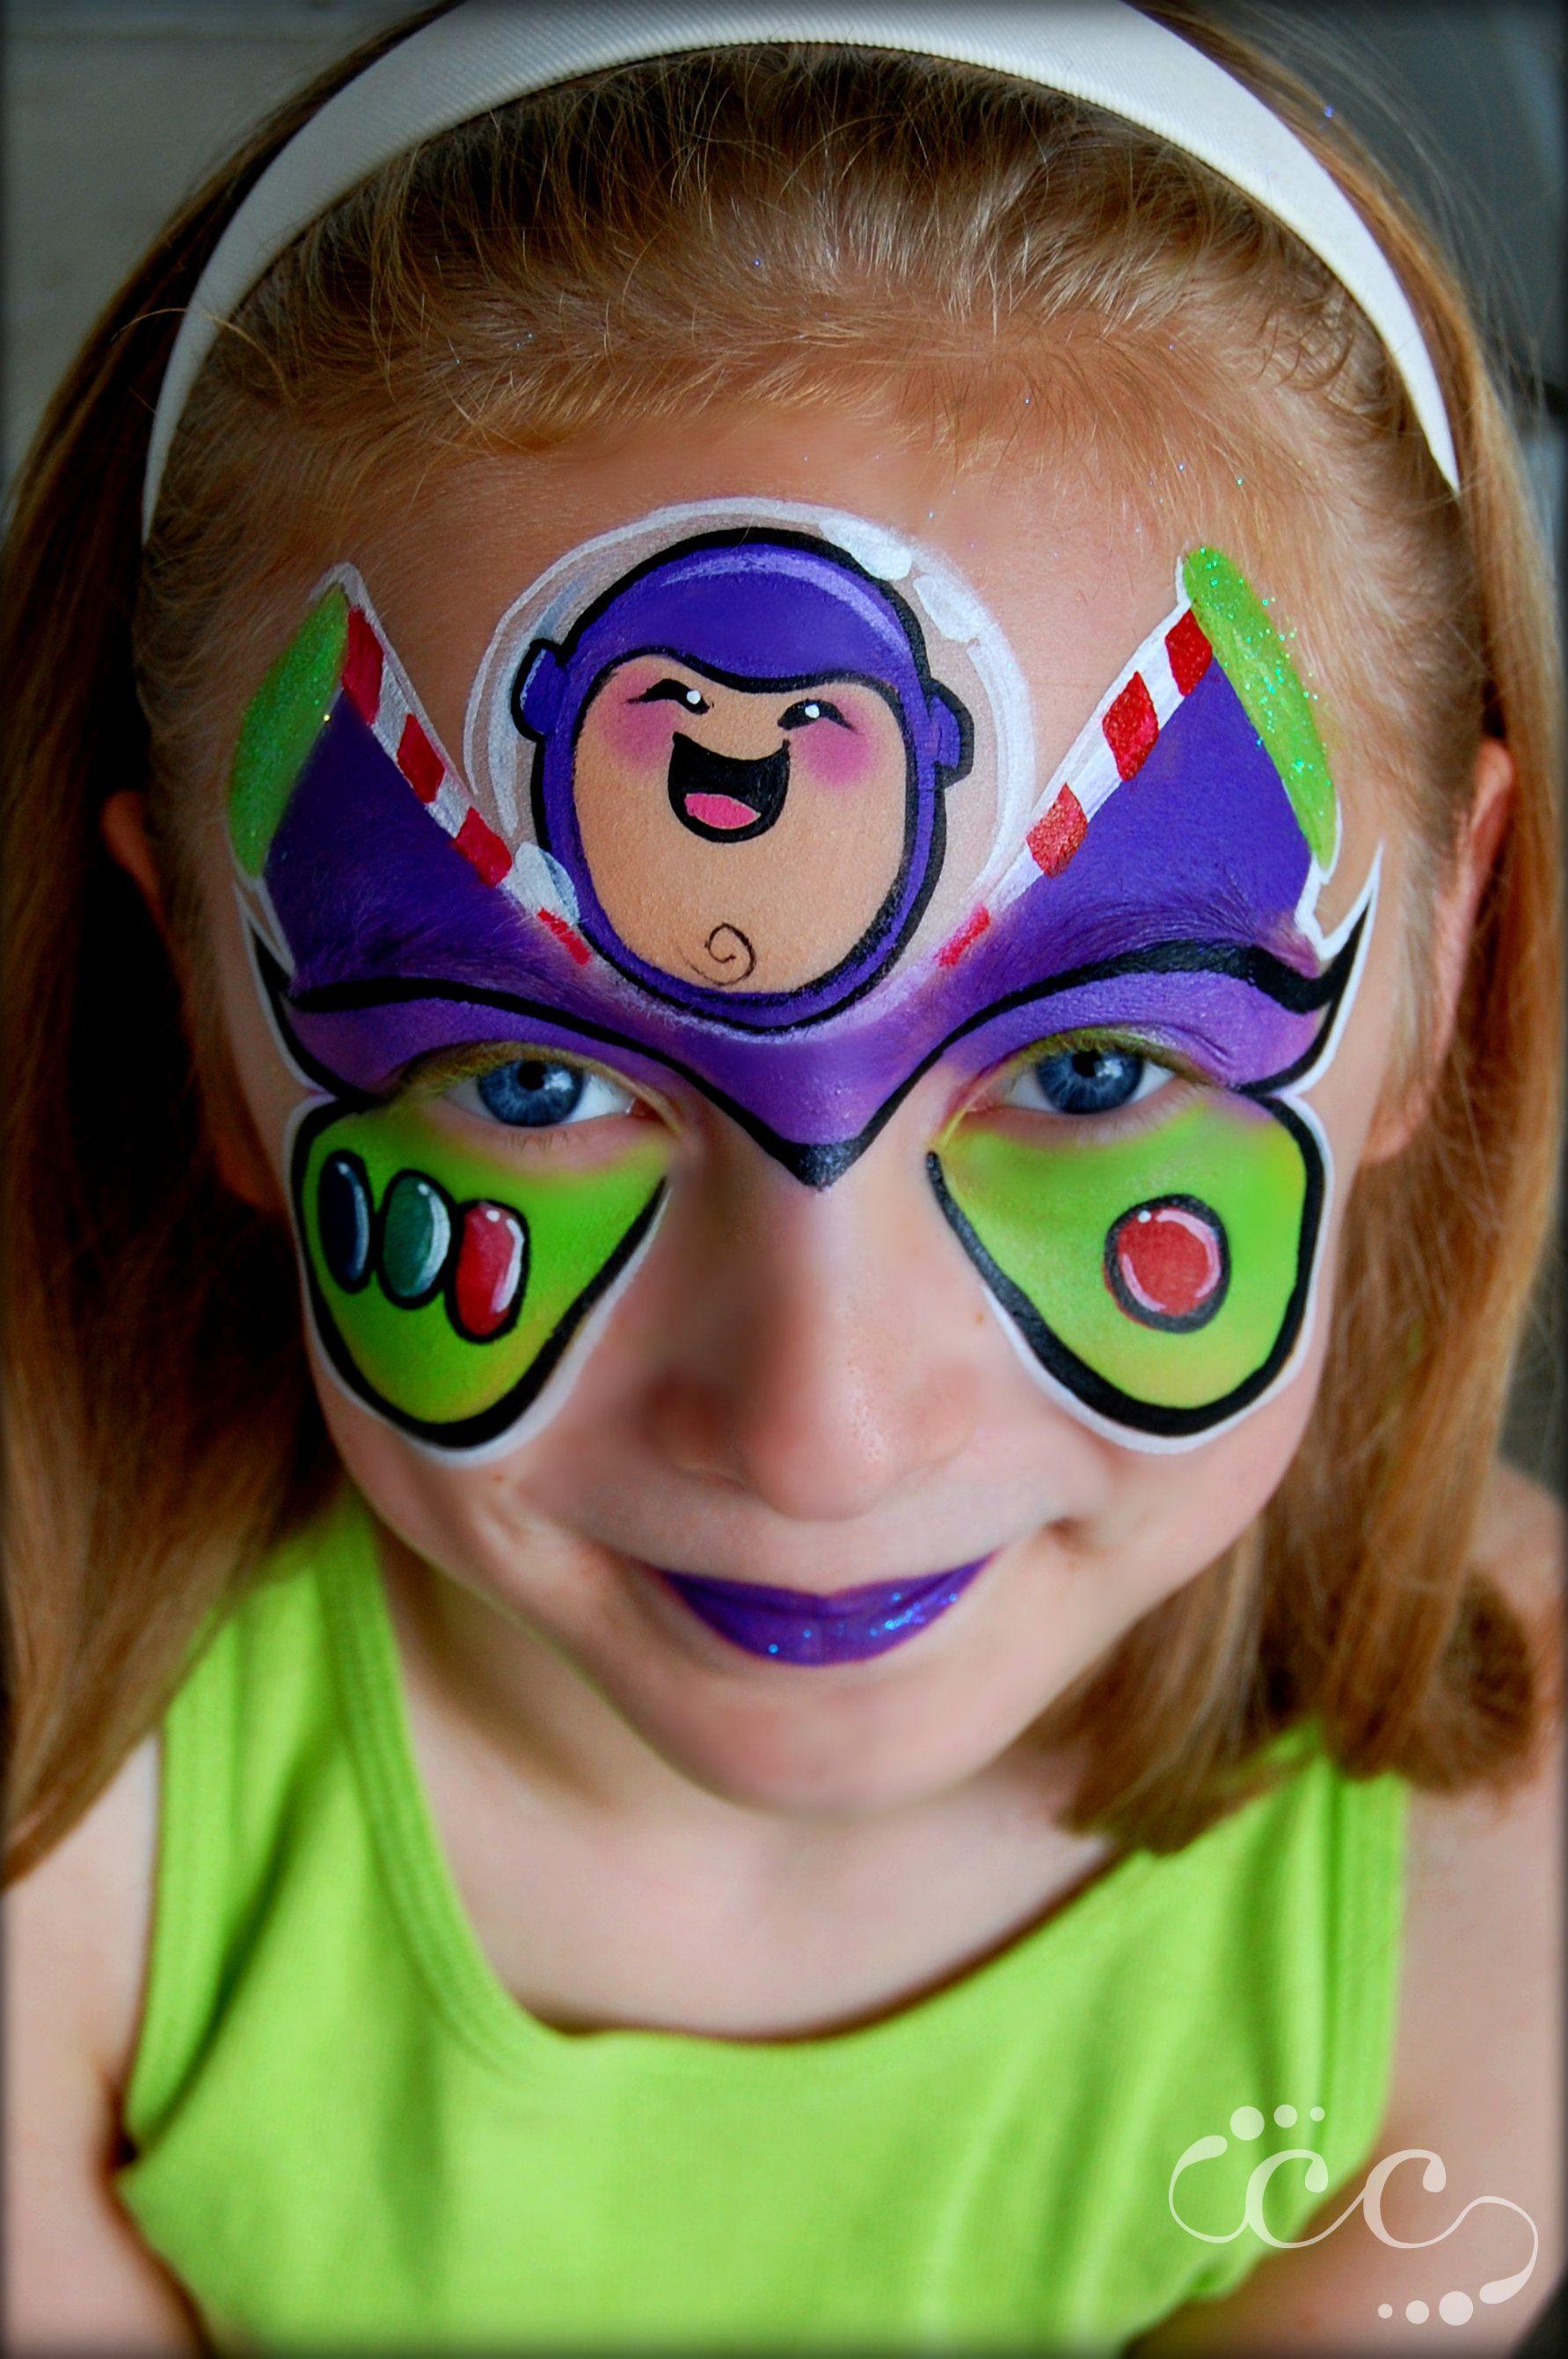 Buzz Lightyear #ToyStory #Inspired #Buzz #Disney #facepaint #design ...